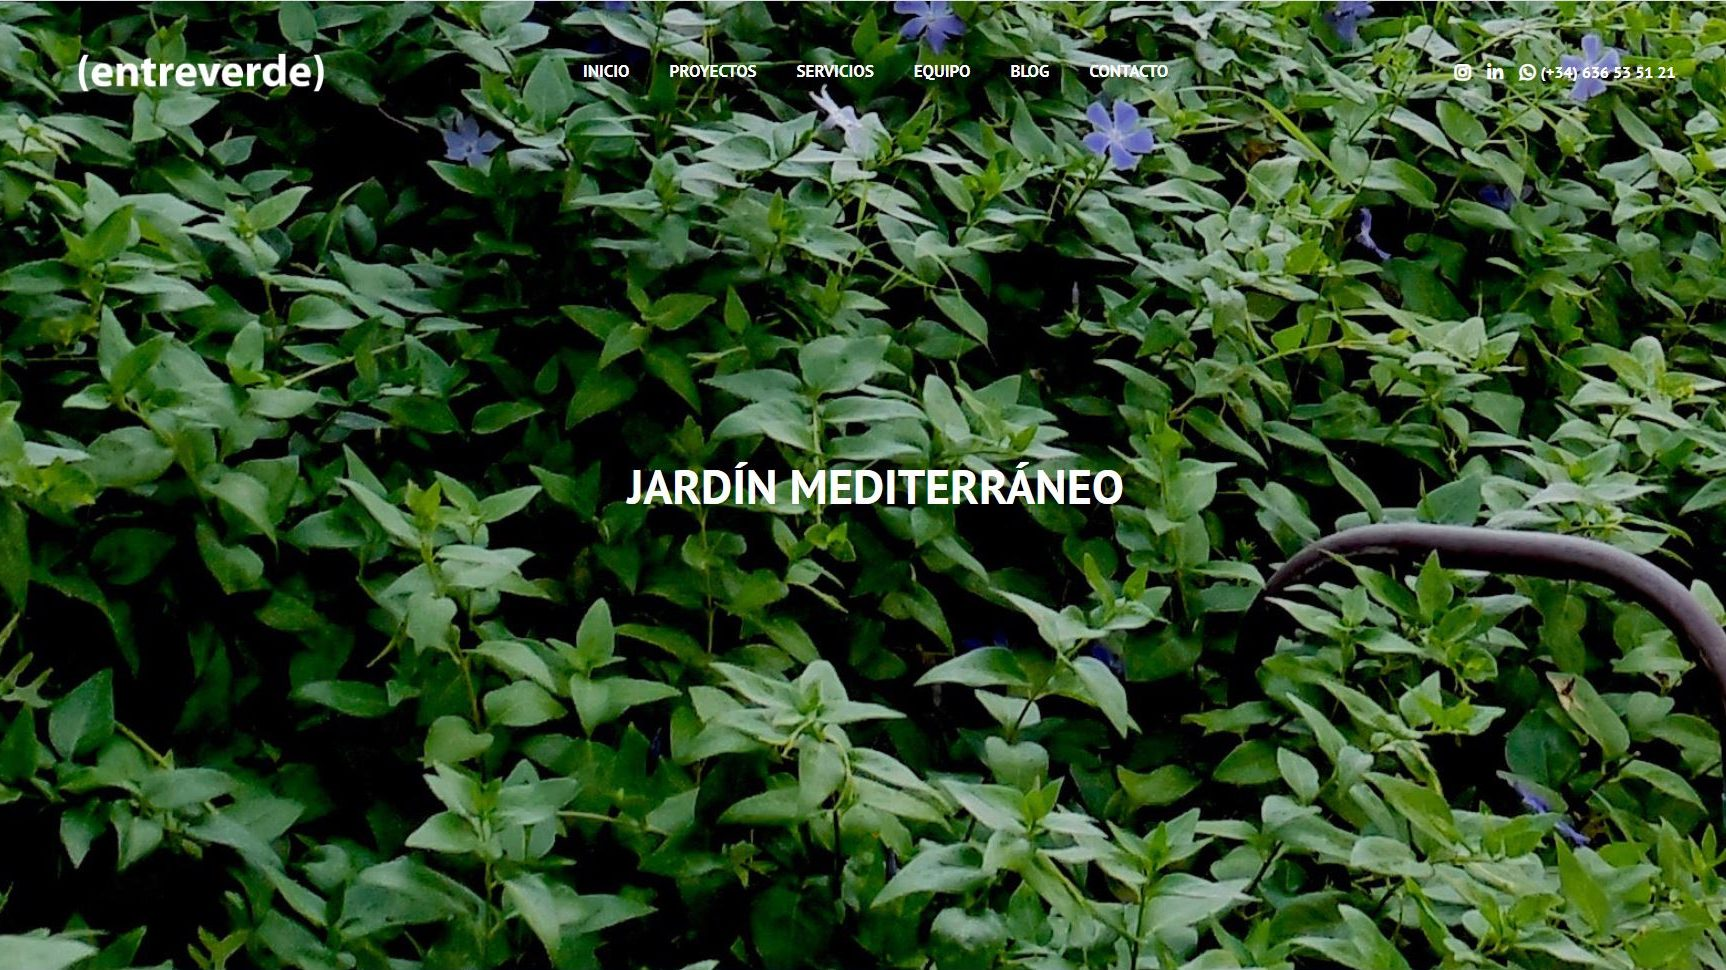 Diseño web de paisajismo para entreverde